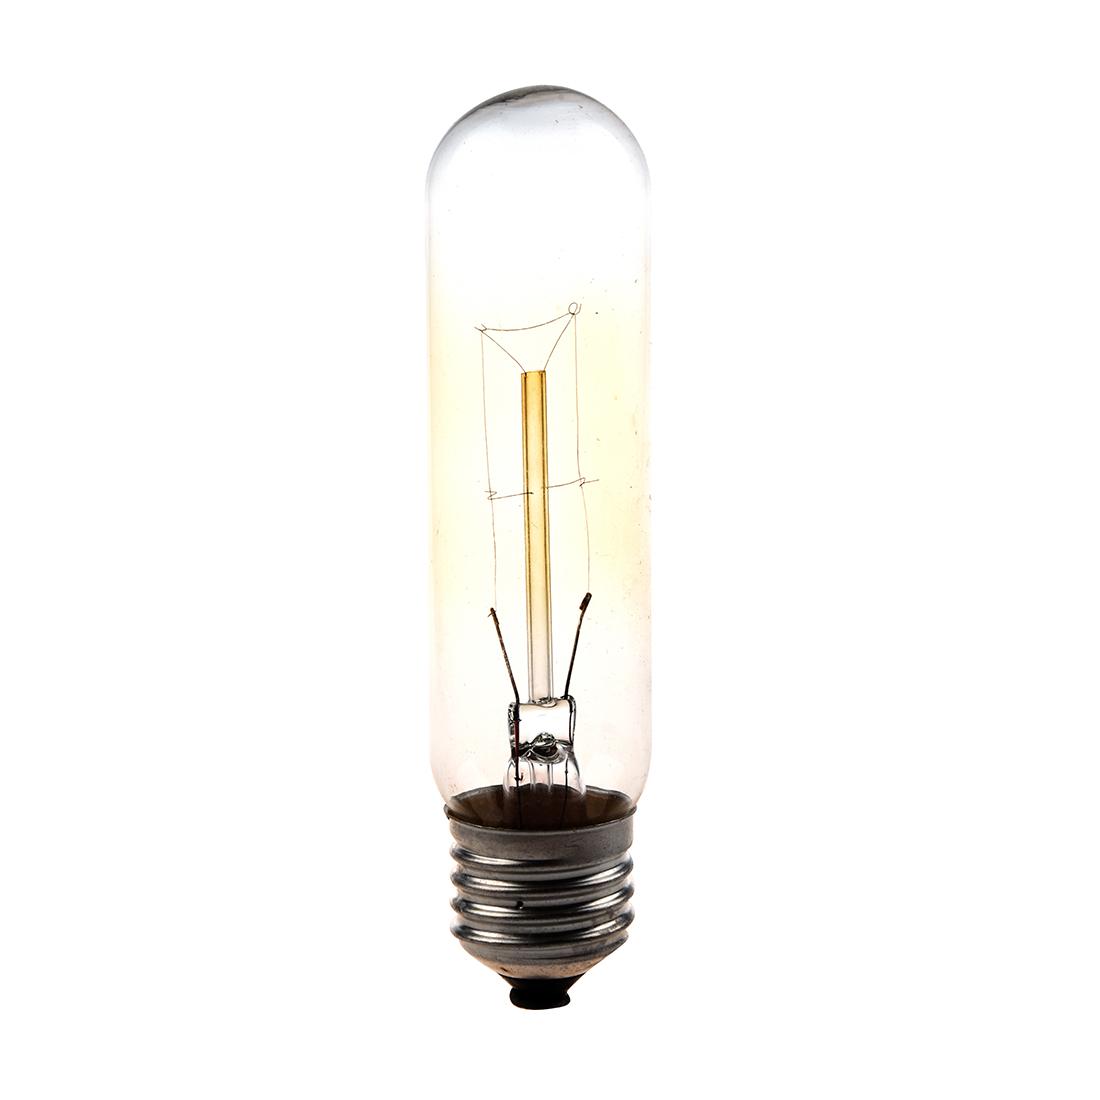 e27 40w vintage retro filament edison tungsten light bulb antique lamp led hp ebay. Black Bedroom Furniture Sets. Home Design Ideas